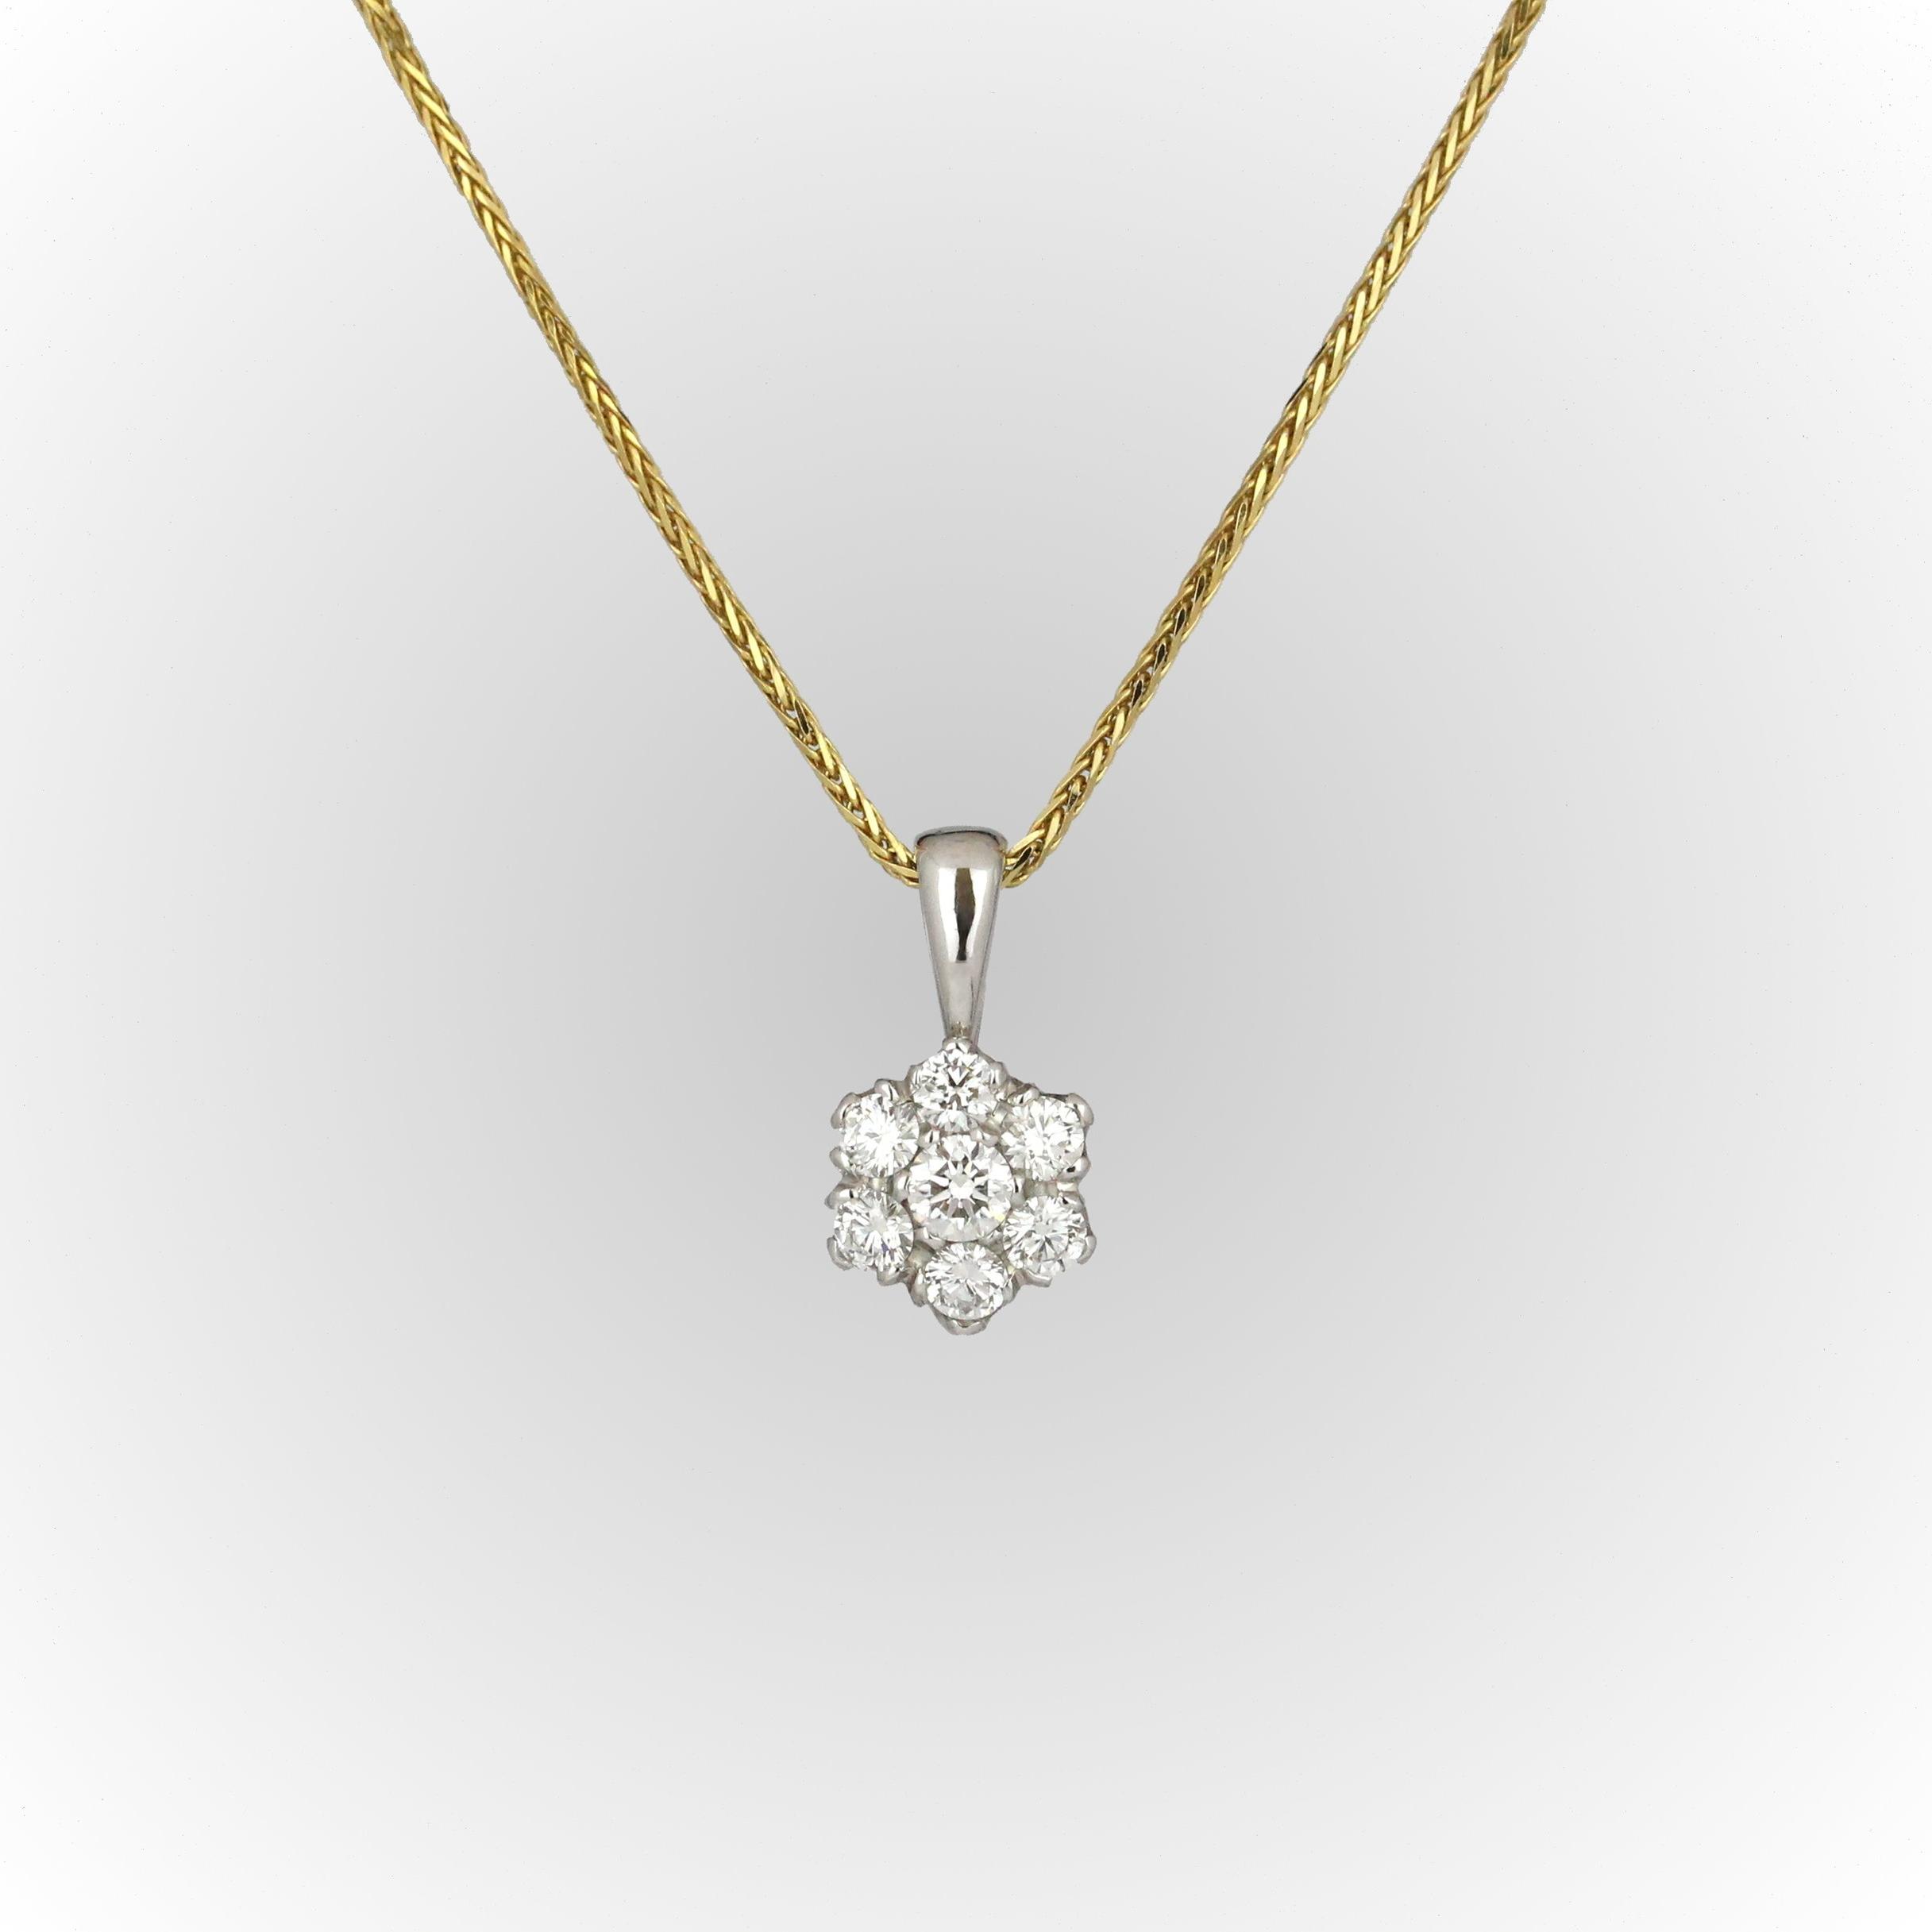 White gold diamond cluster pendant on yellow gold chain.